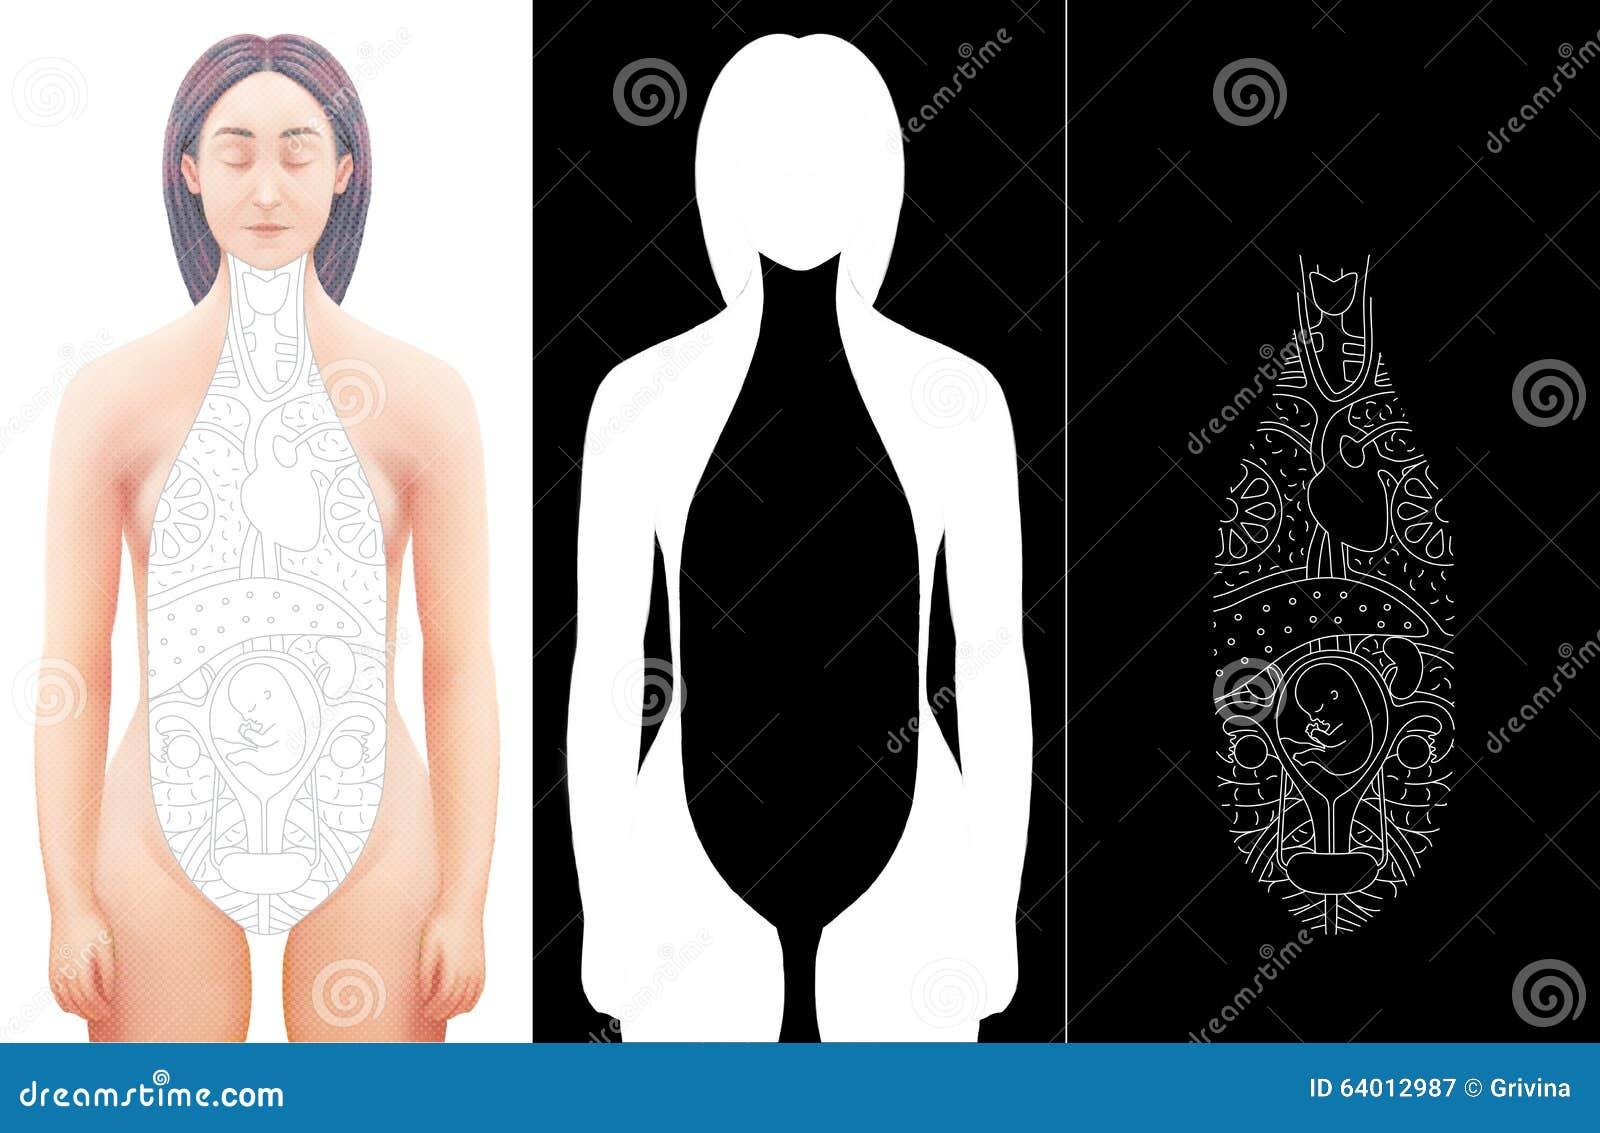 Illustration Of Hand Drawn Excised Female Anatomy Model Stock ...